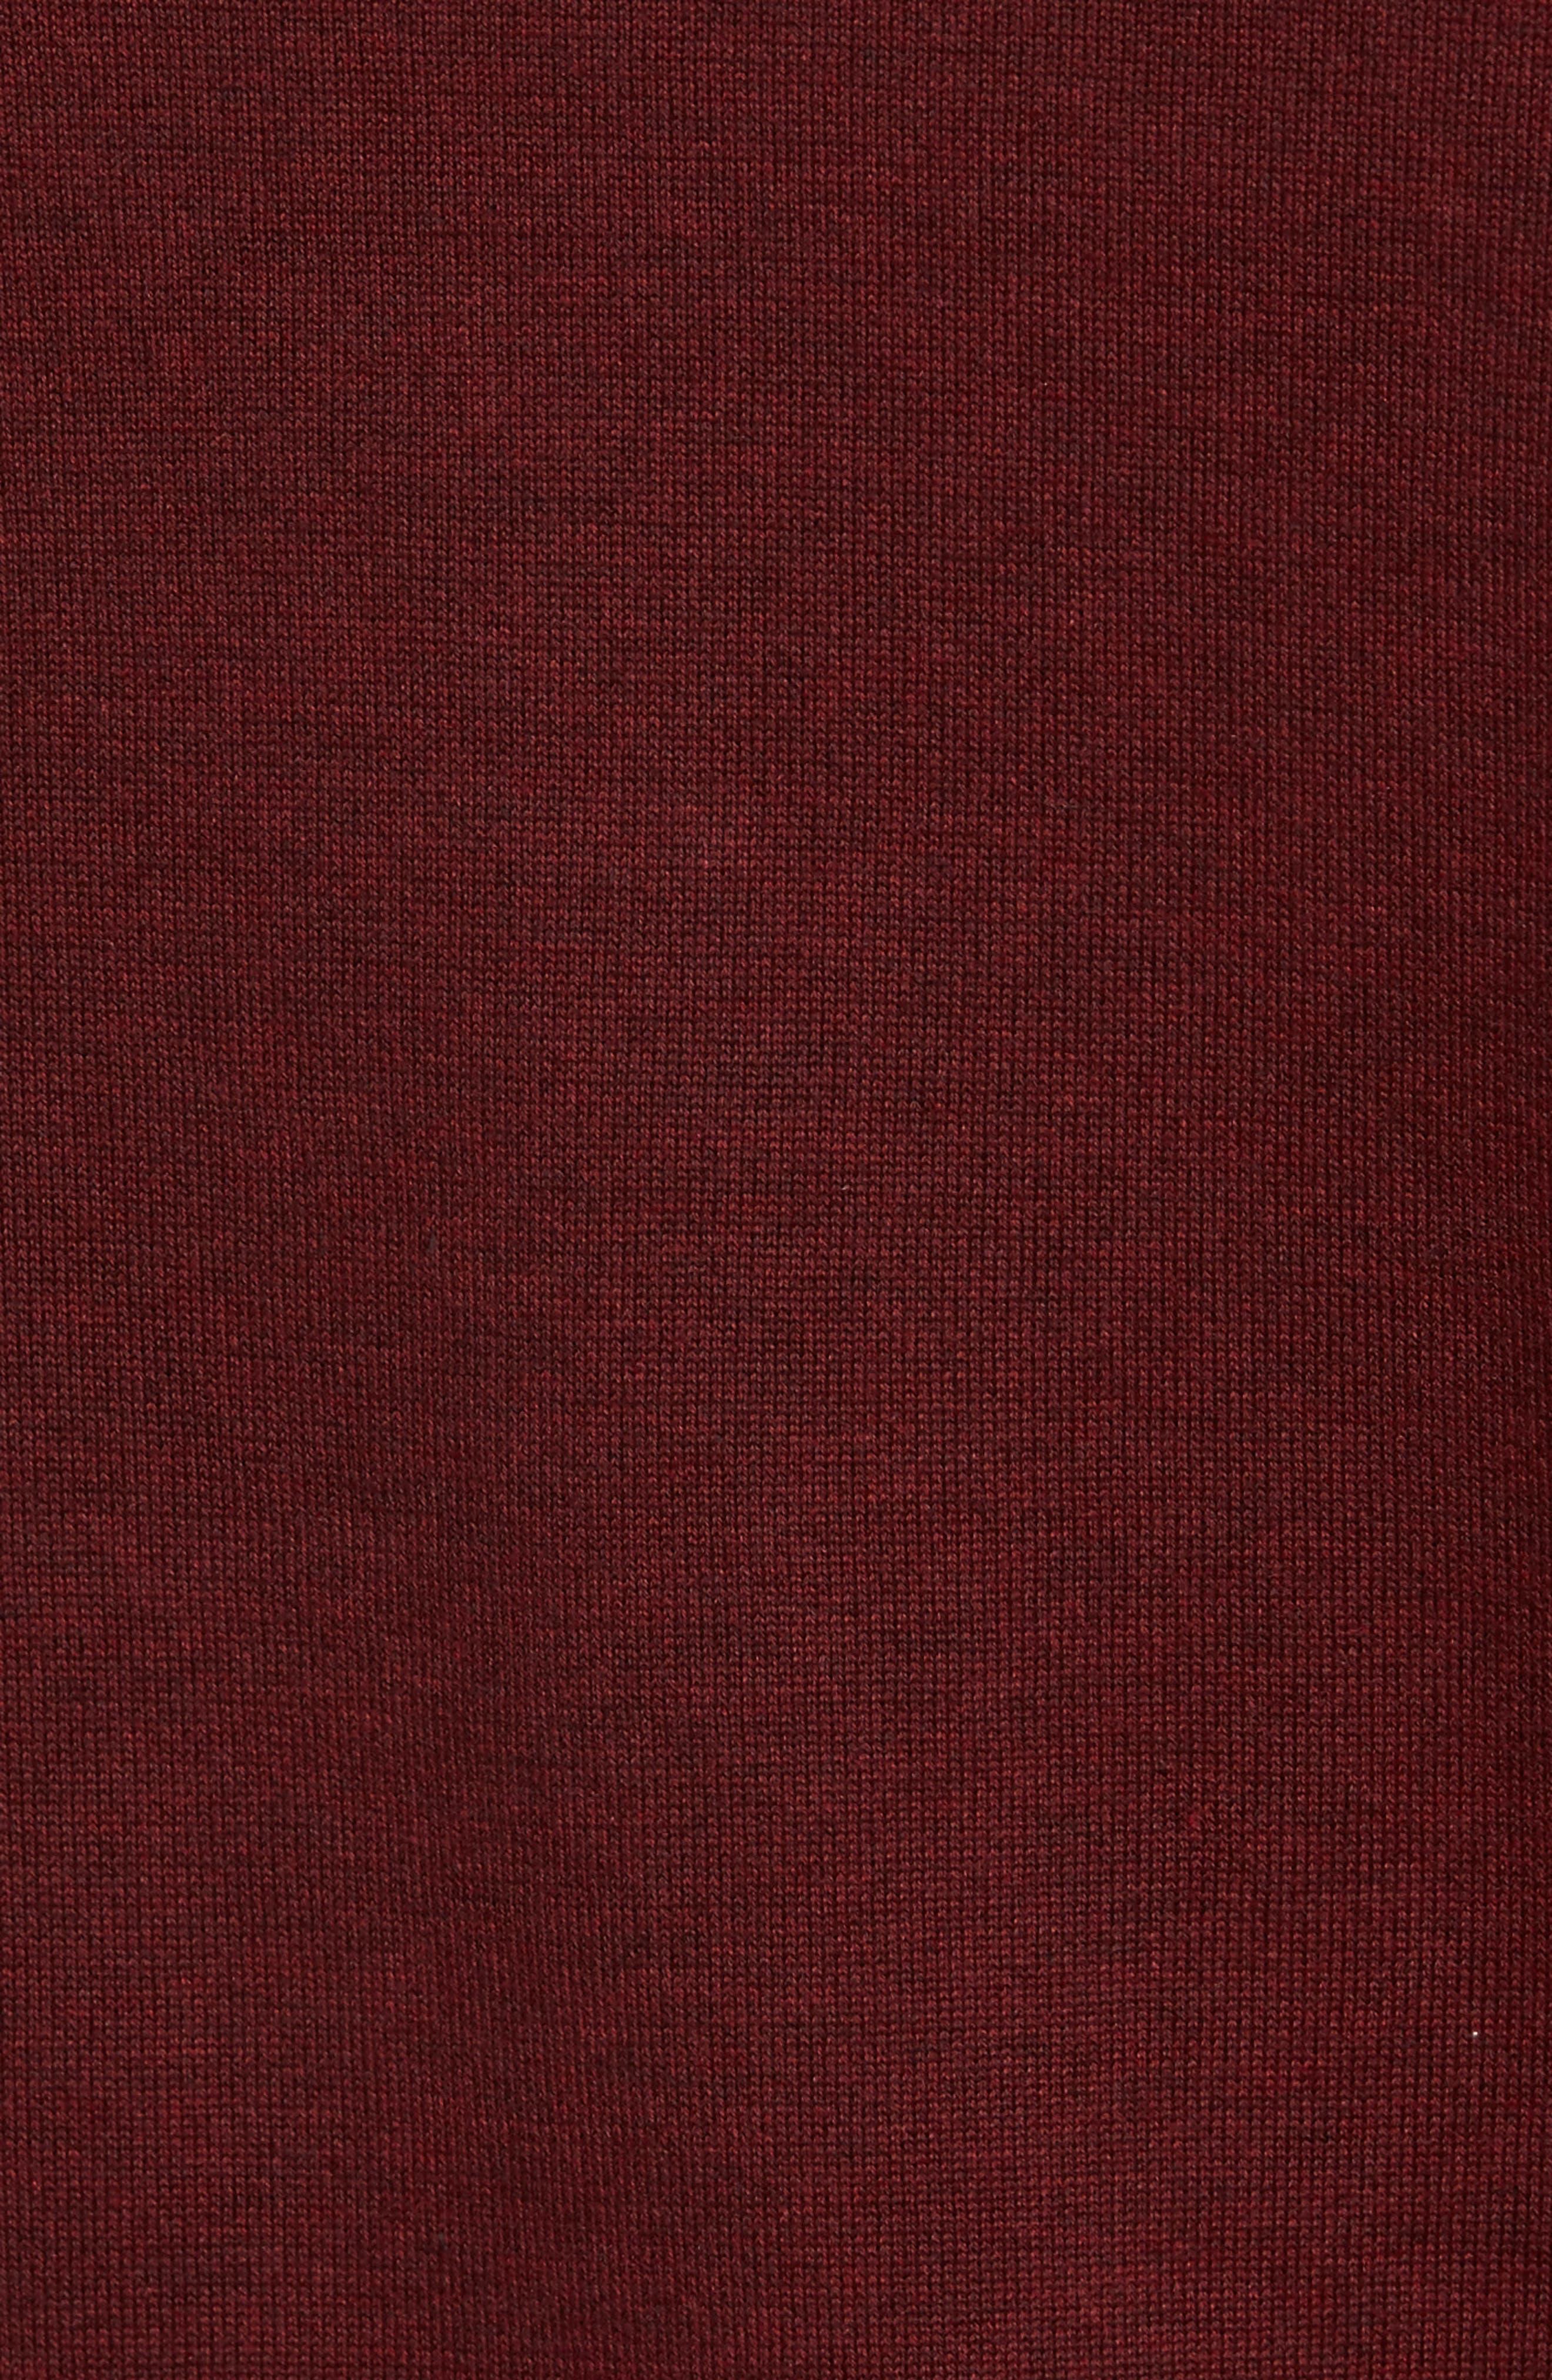 Alternate Image 5  - Lacoste Jersey Knit Crewneck Sweater